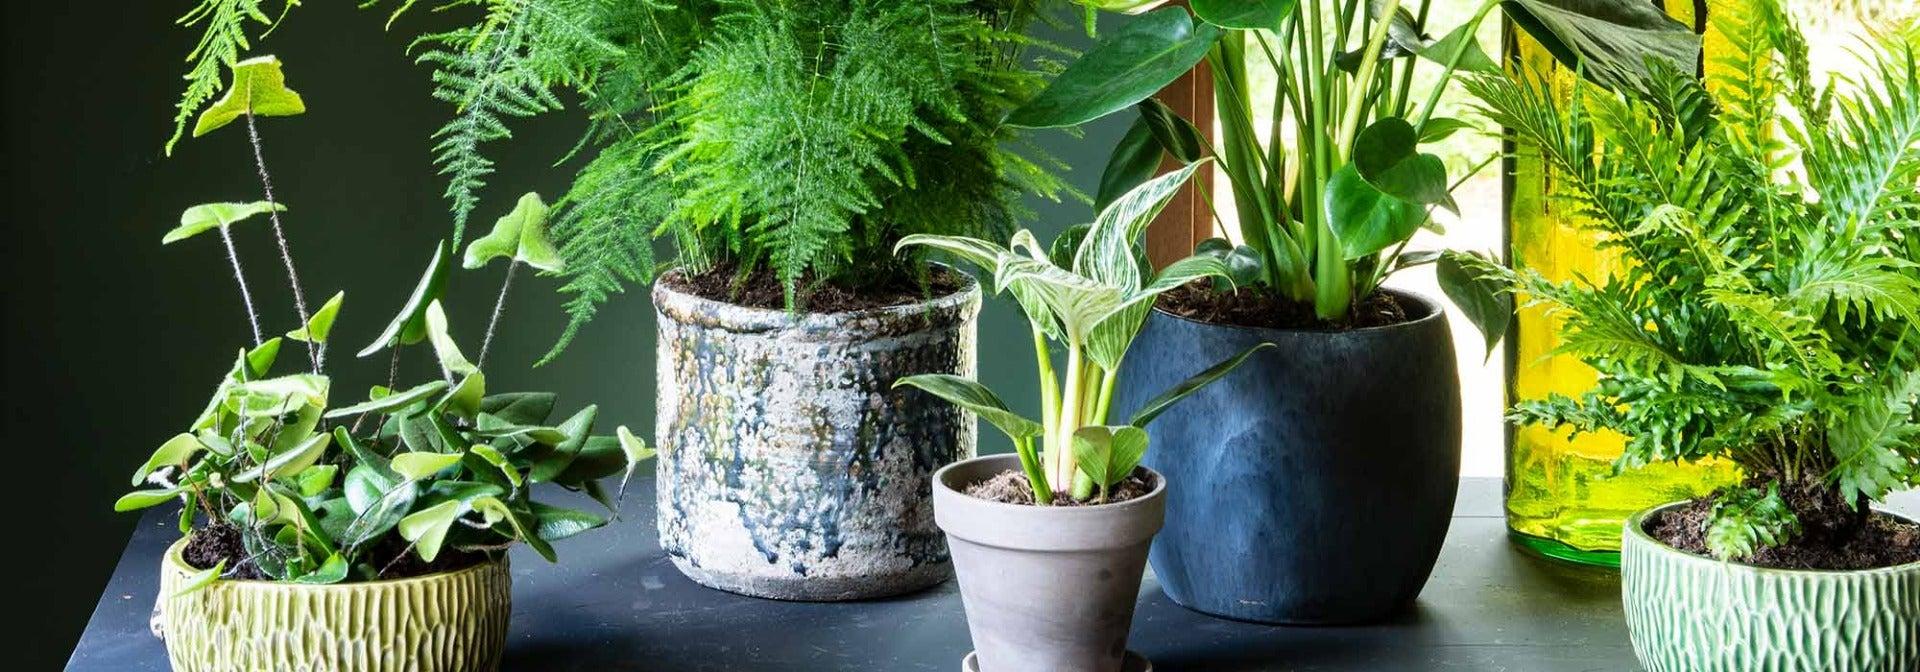 Welke kamerplant past bij jou